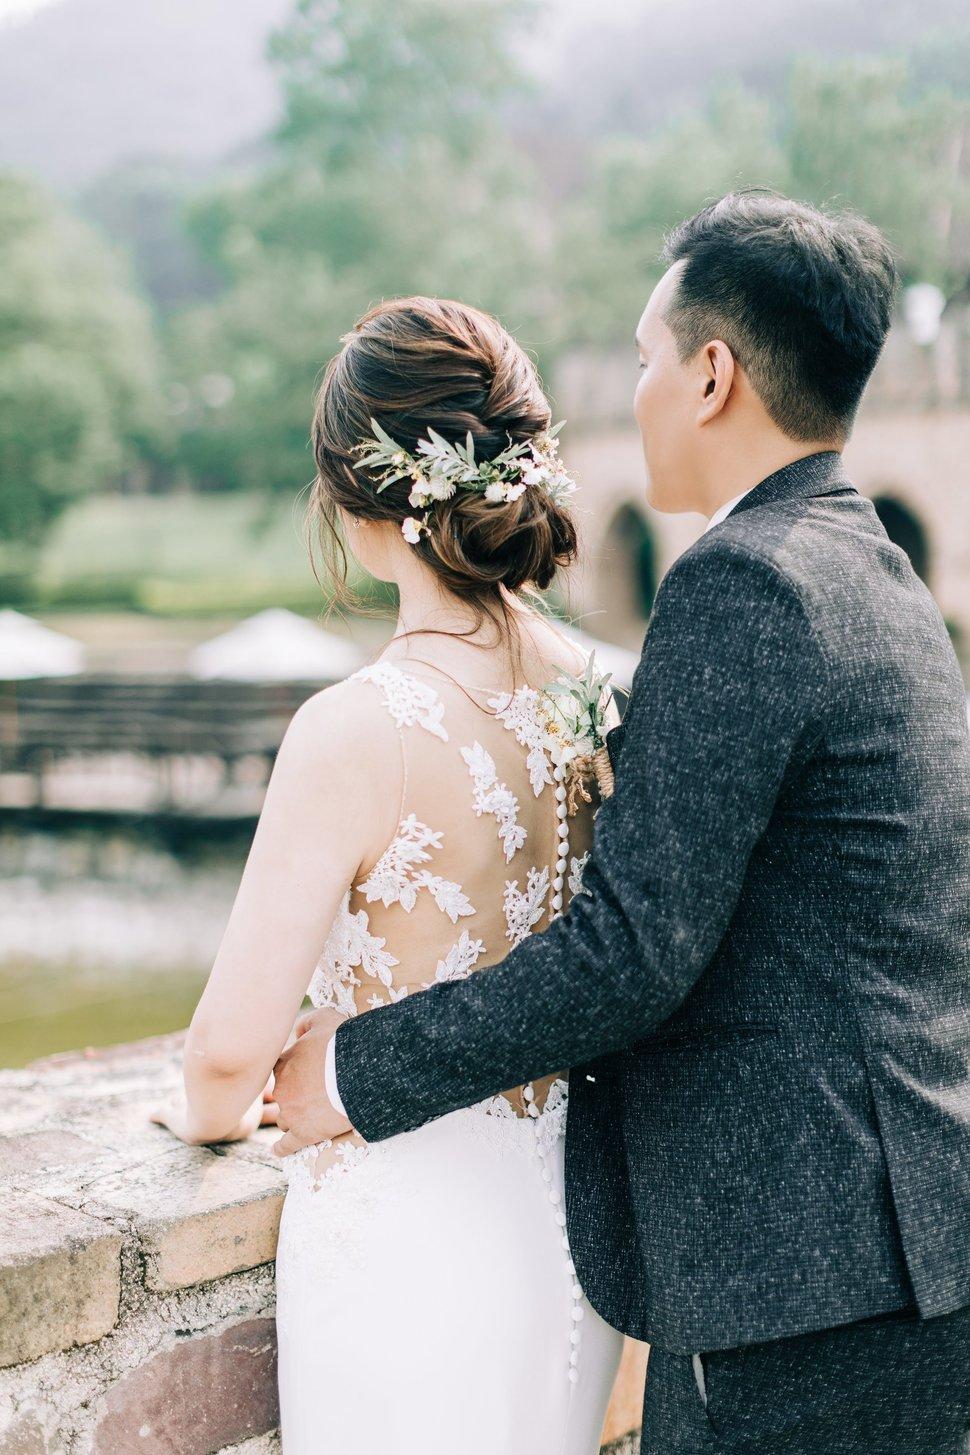 AG3_6882A - Cradle Wedding搖籃手工婚紗《結婚吧》